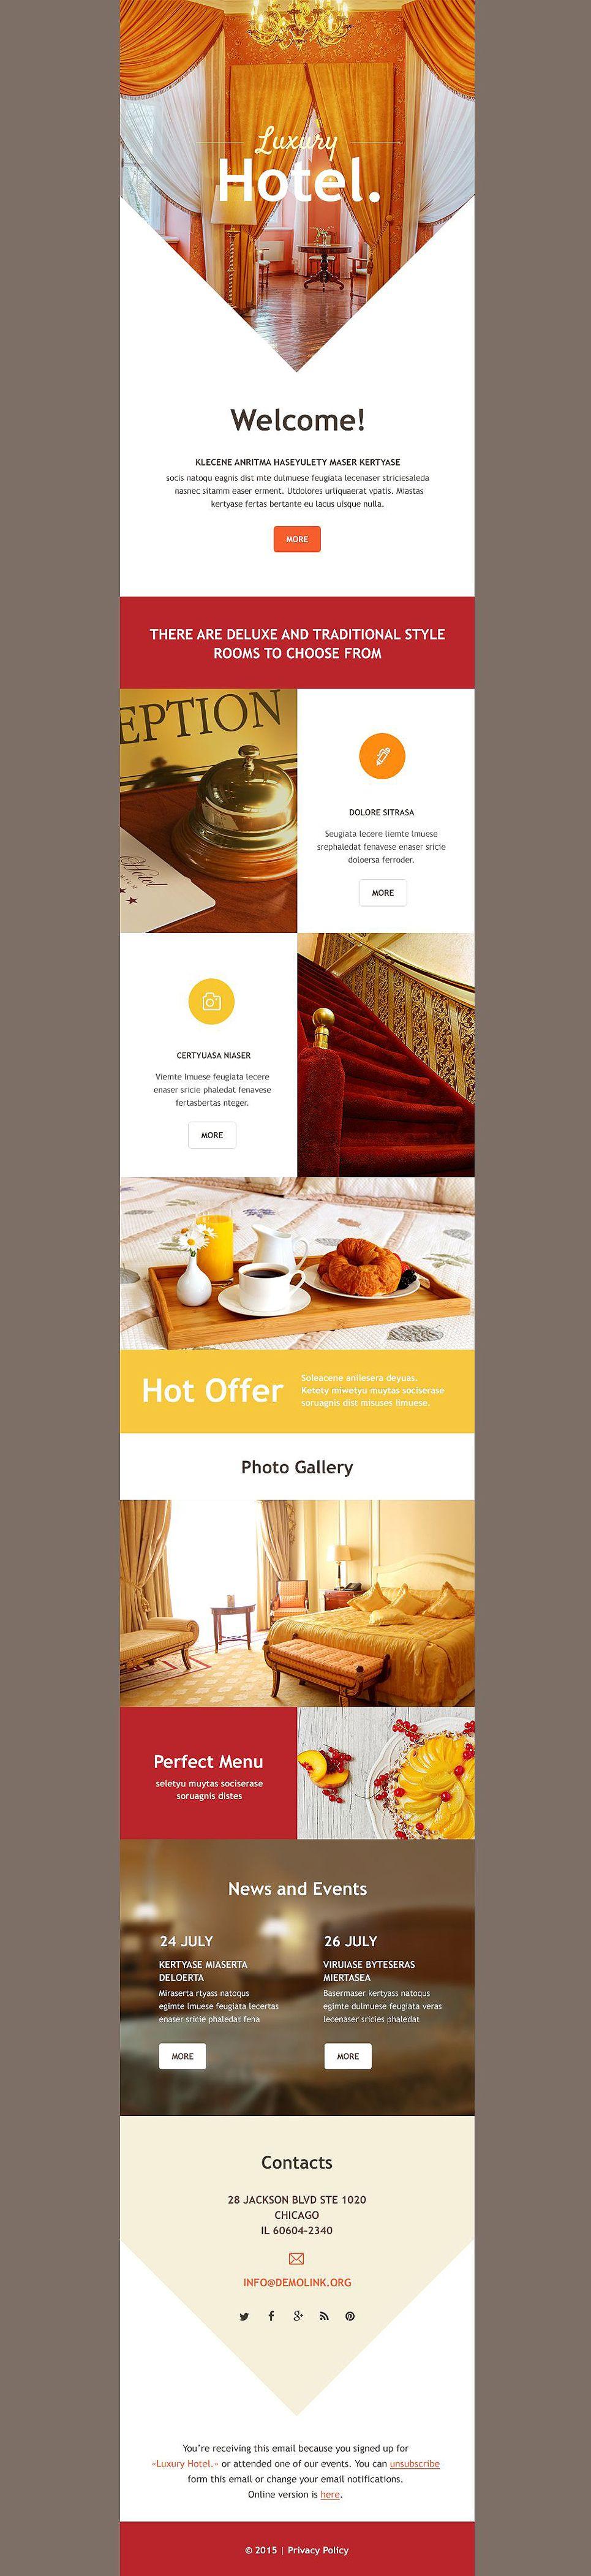 Hotels Responsive Newsletter Template | Newsletter templates